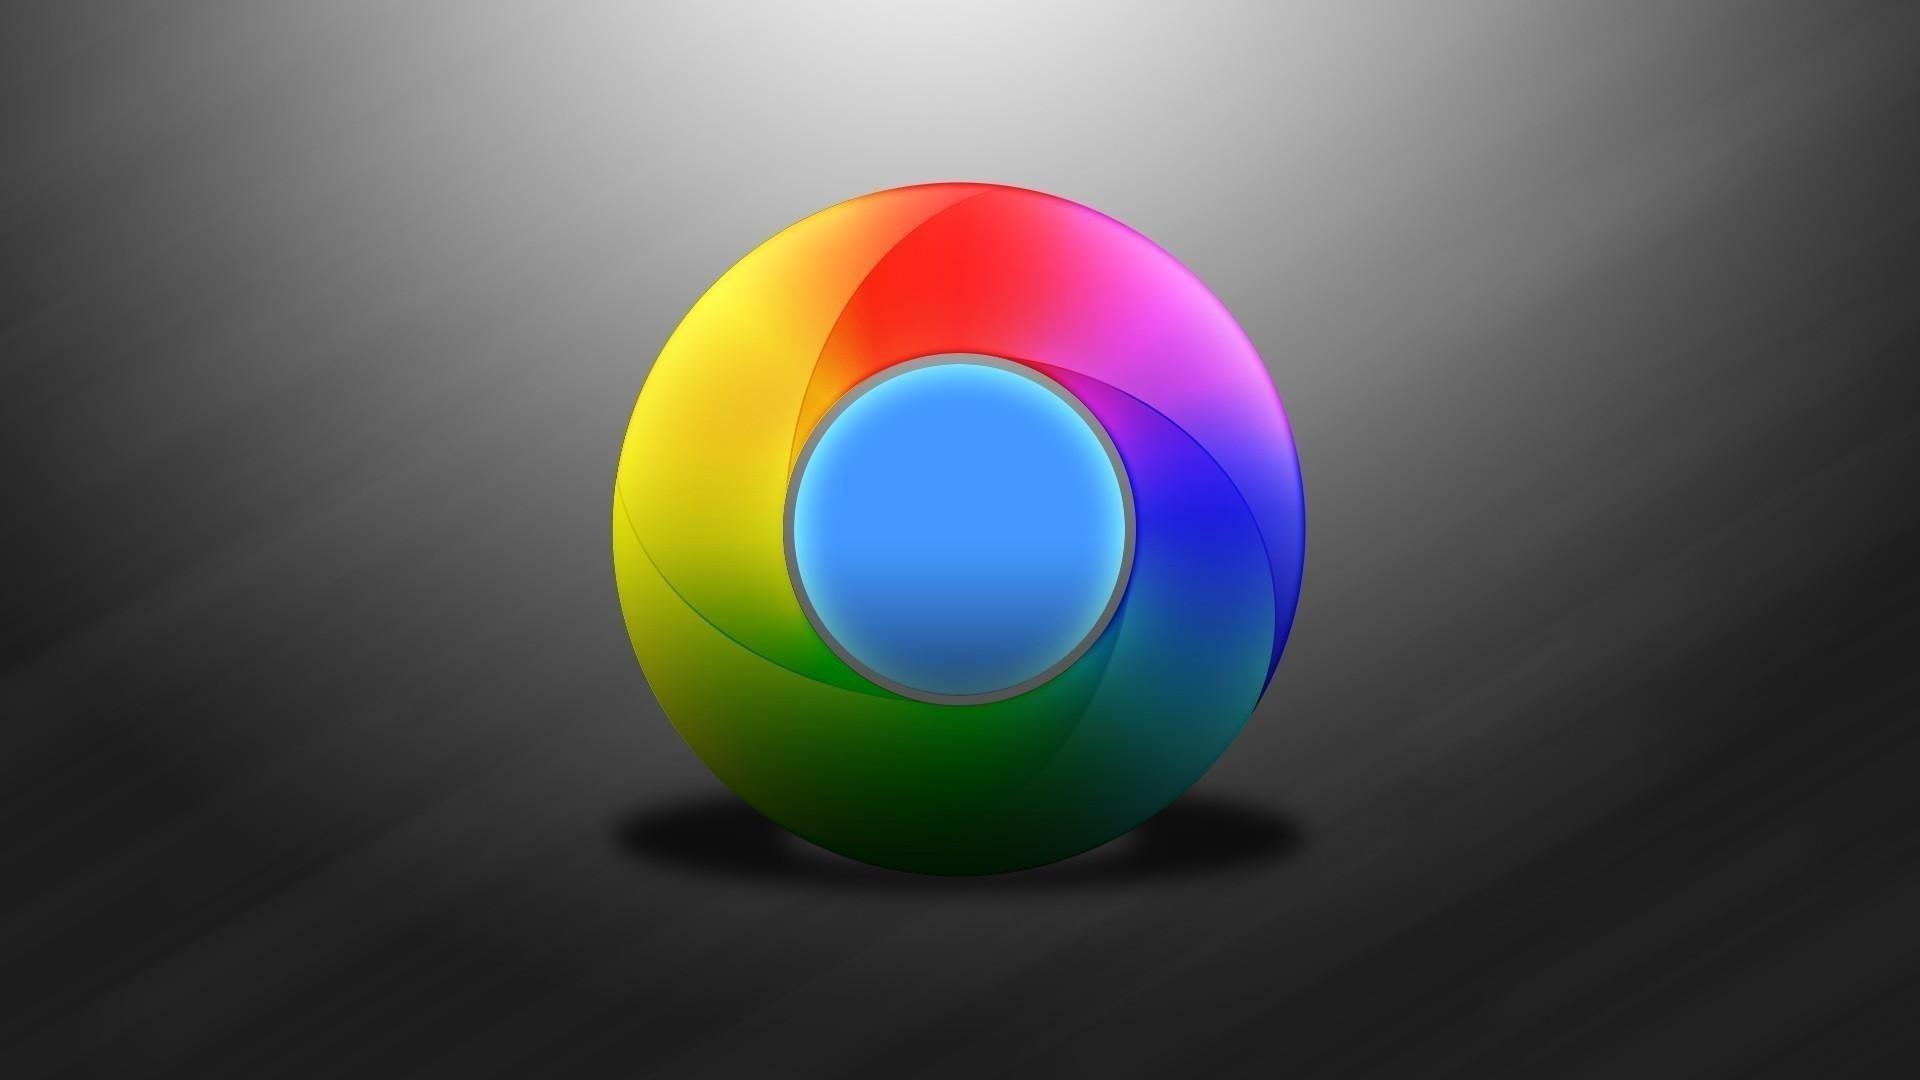 Chrome HD Wallpaper